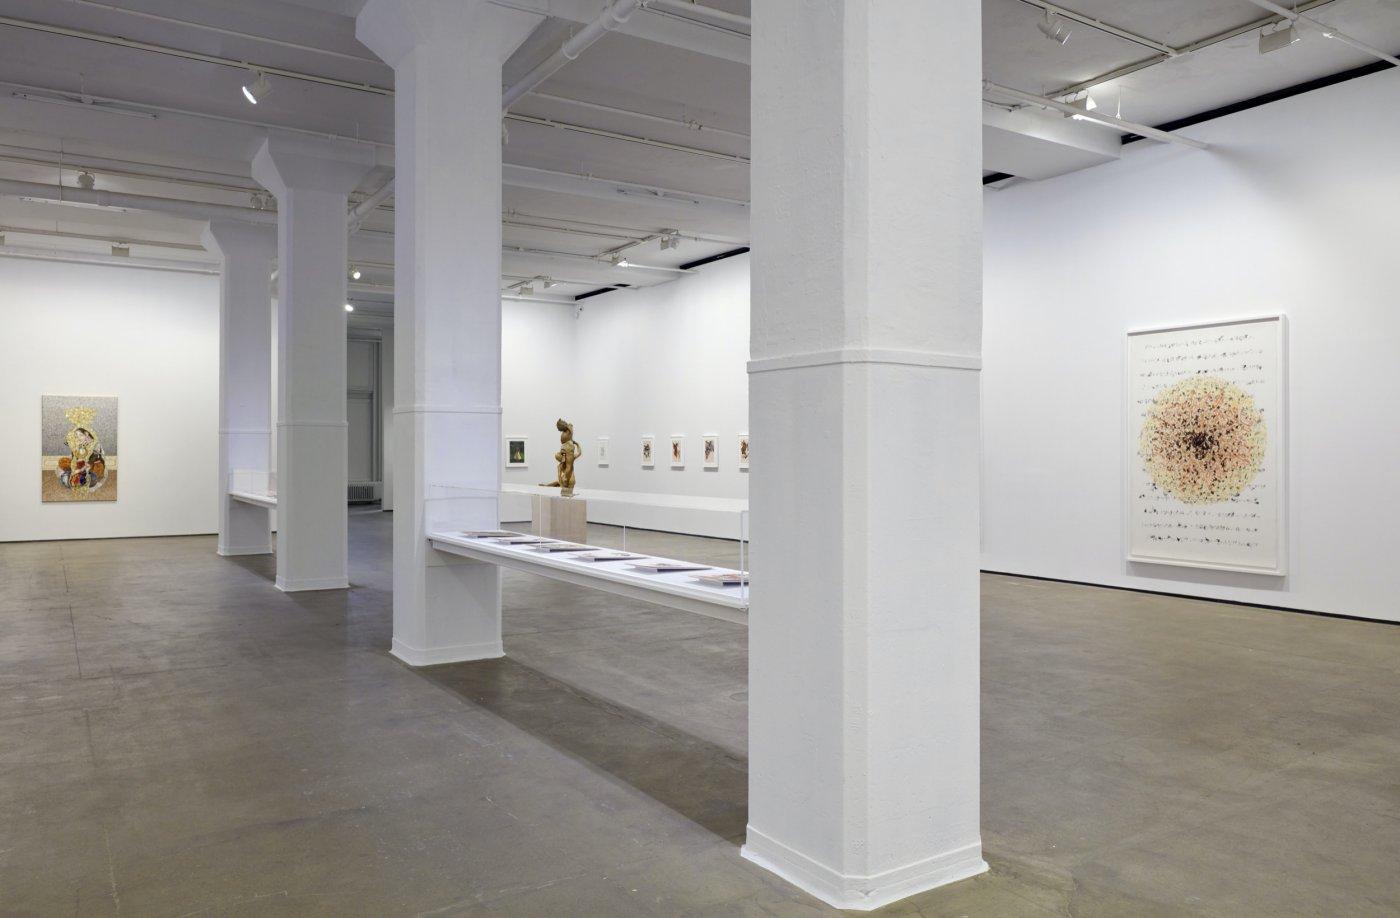 Sean Kelly Gallery Shahzia Sikander 11